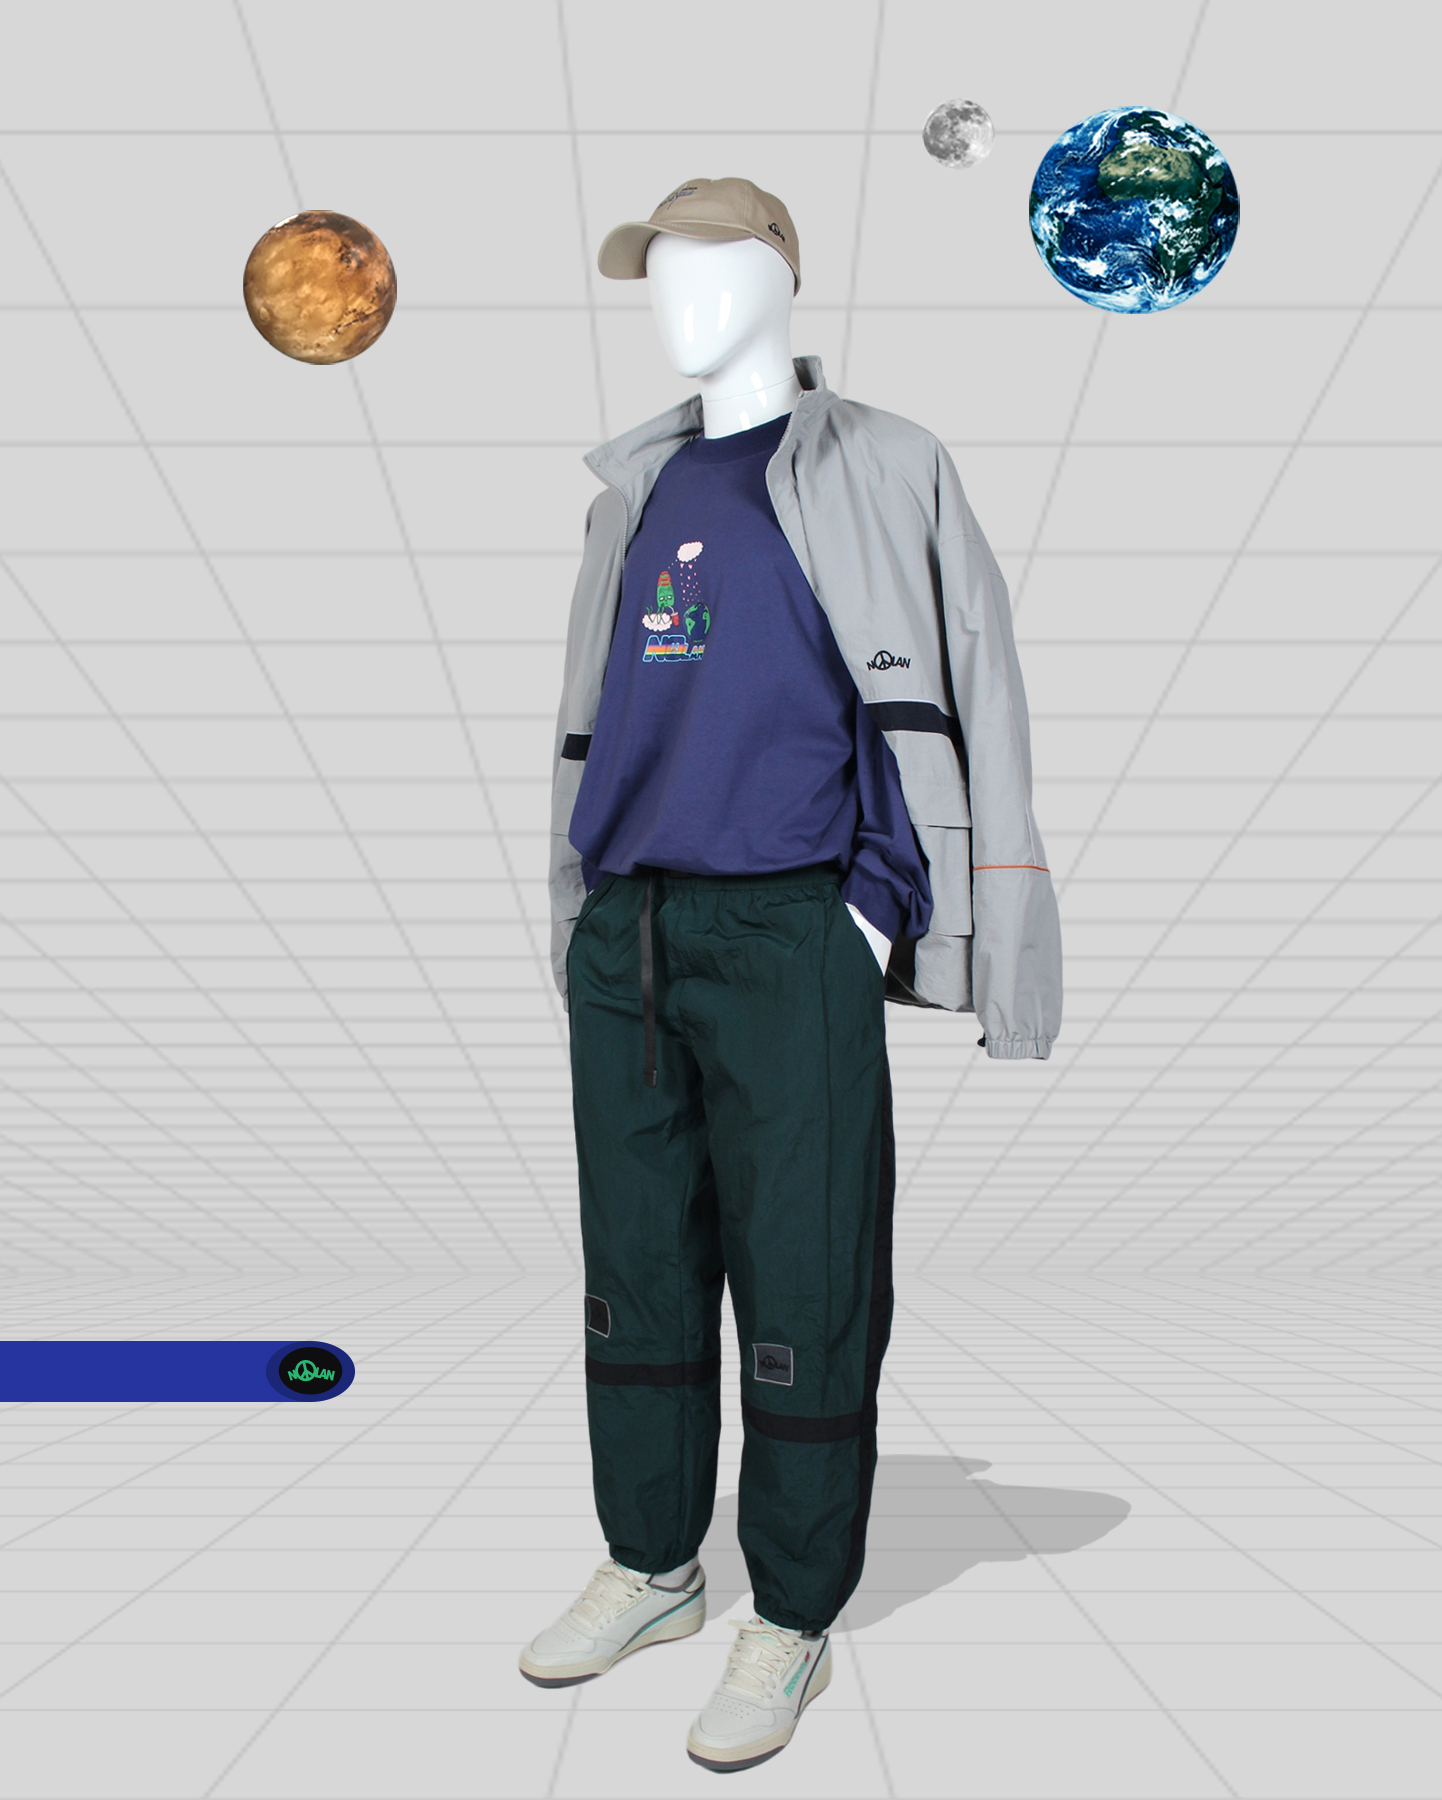 FW18 Robot AD 4.jpg